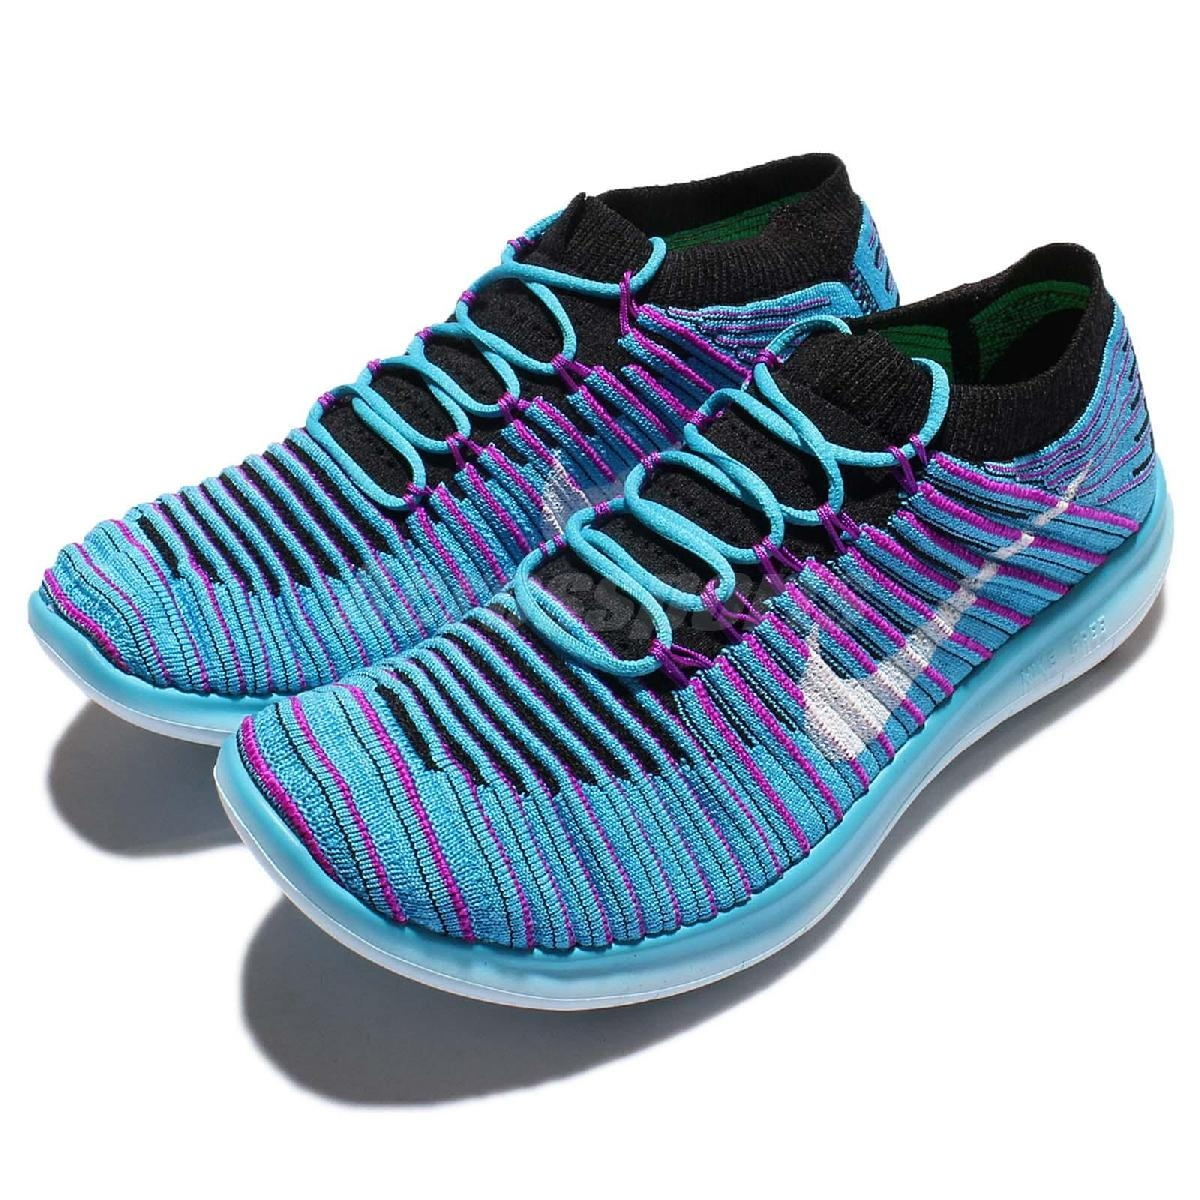 Nike慢跑鞋Wmns Free RN Motion Flyknit Run 5.0赤足藍紫白勾女鞋PUMP306 834585-401